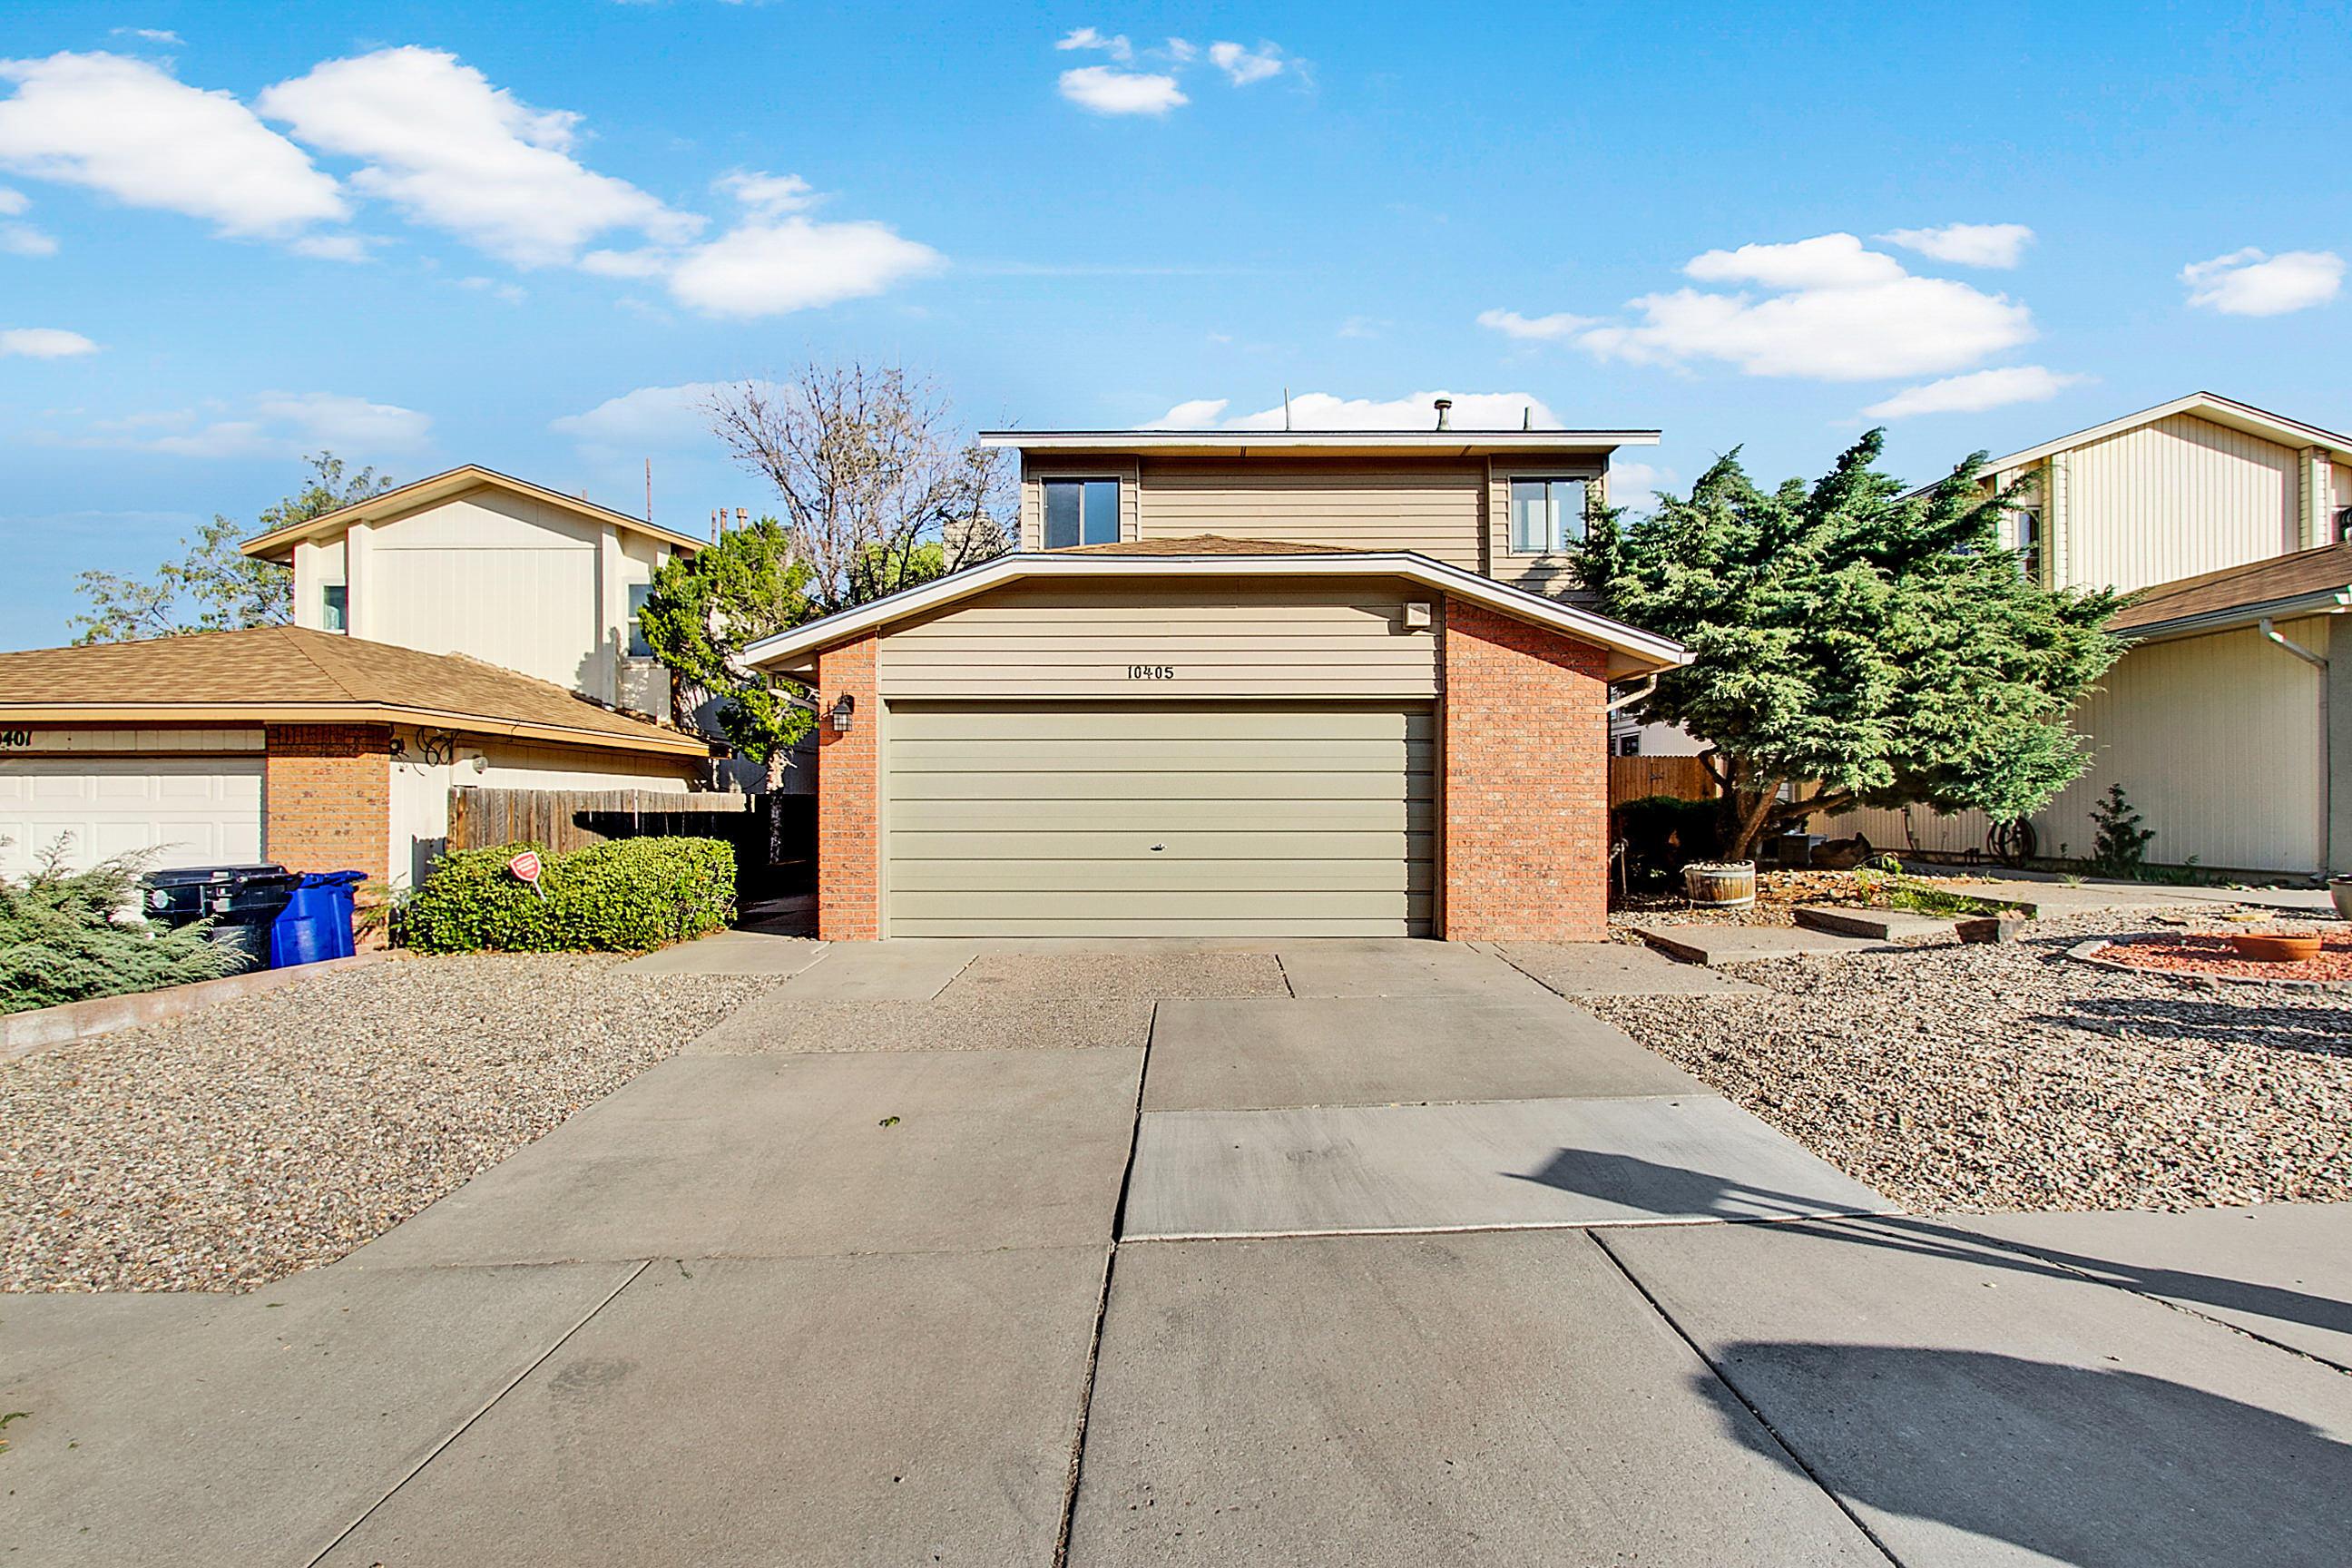 10405 OSO GRANDE Road, Albuquerque NM 87111